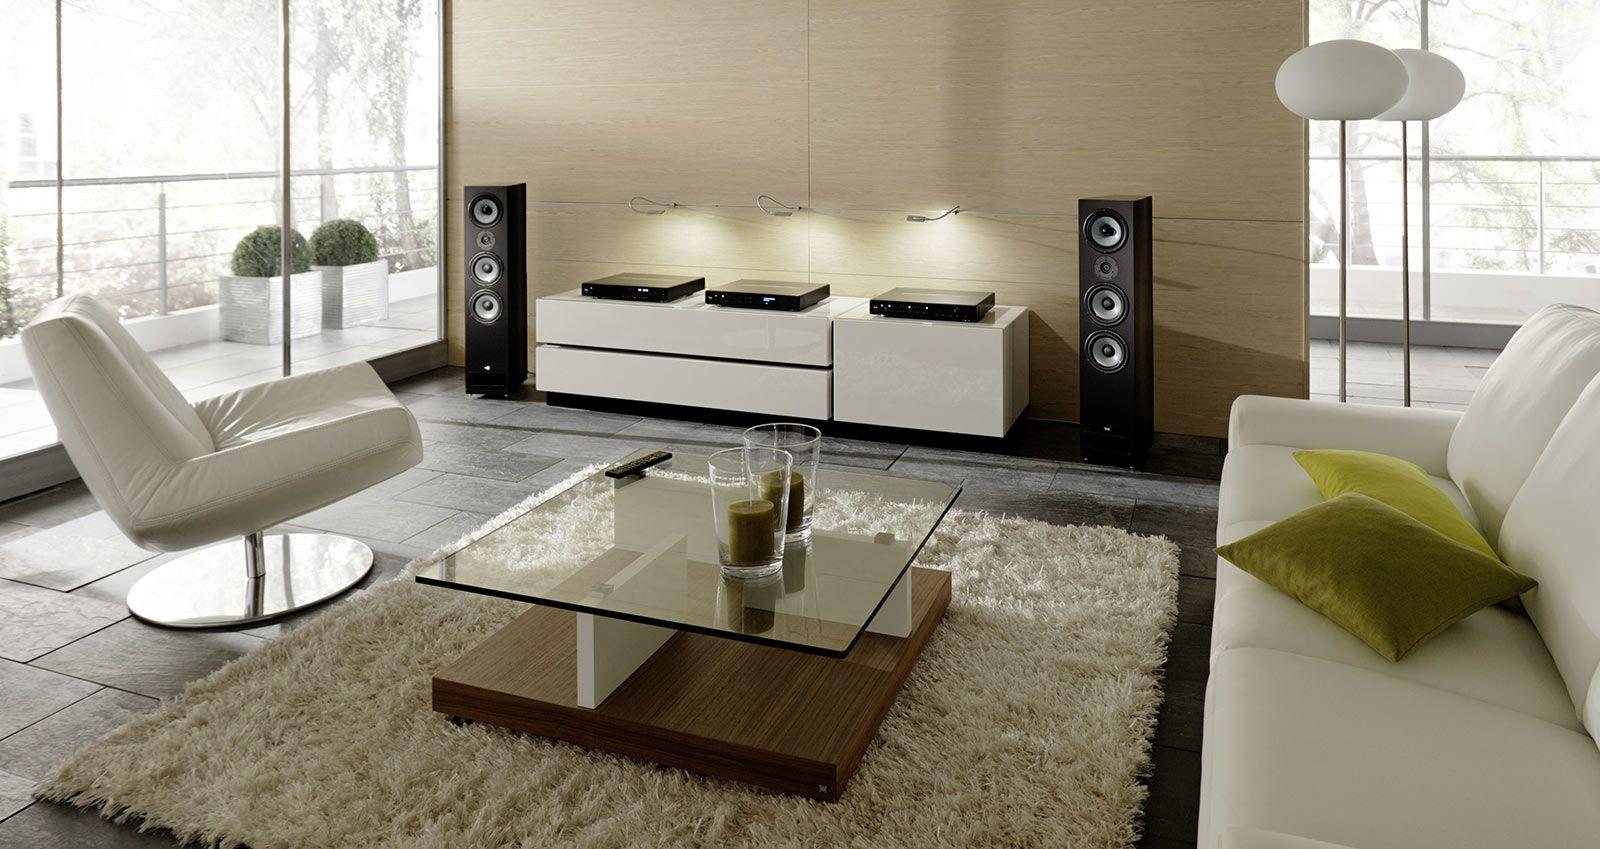 Music Listening Room Design | Home Audio Design Completes Sound Perception Amazing Design